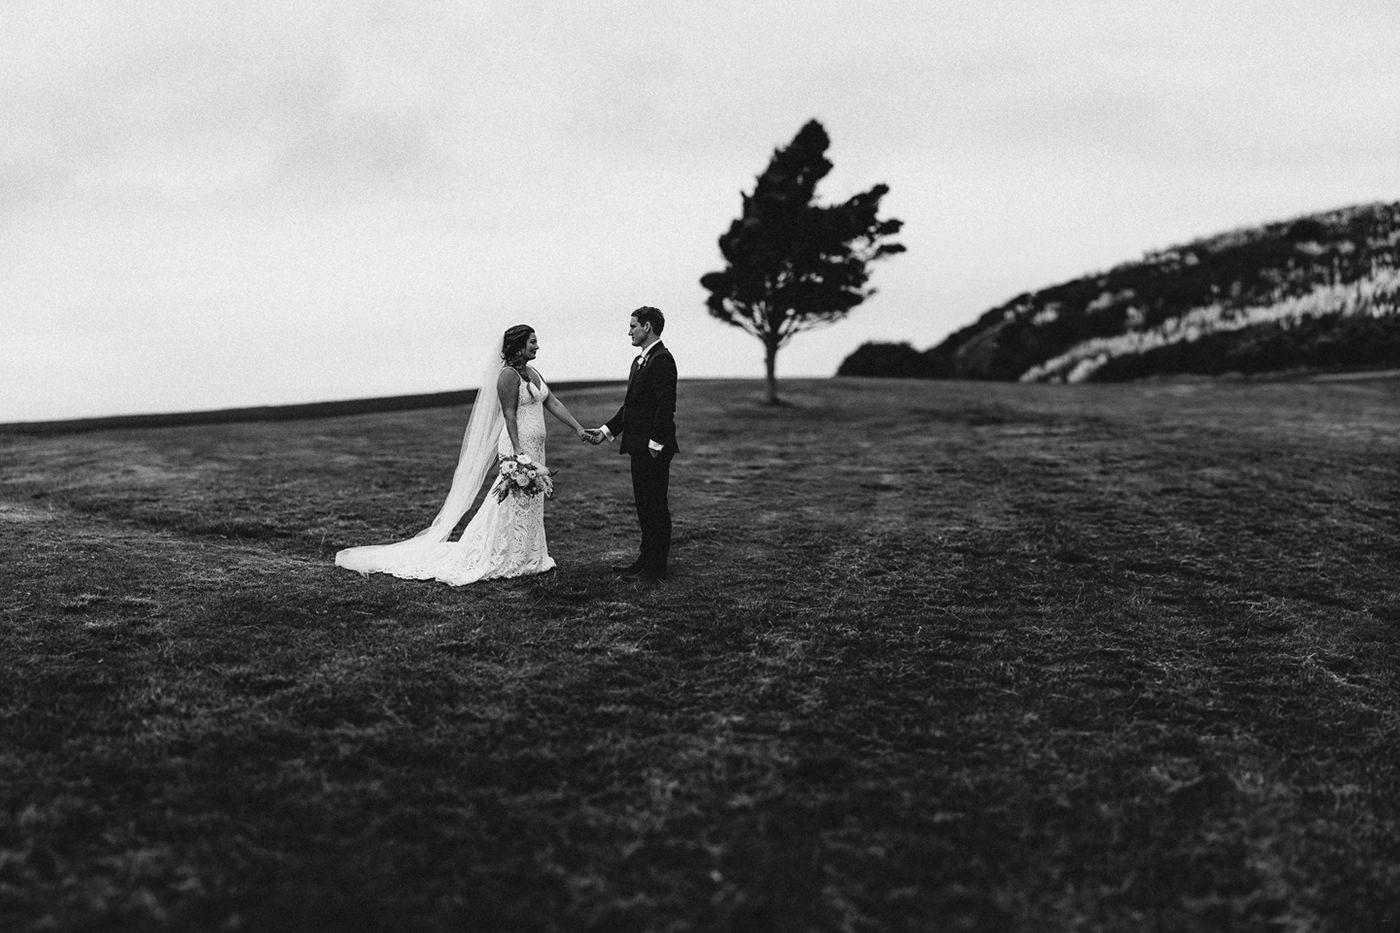 wedding_photographer_nz-00040.jpg